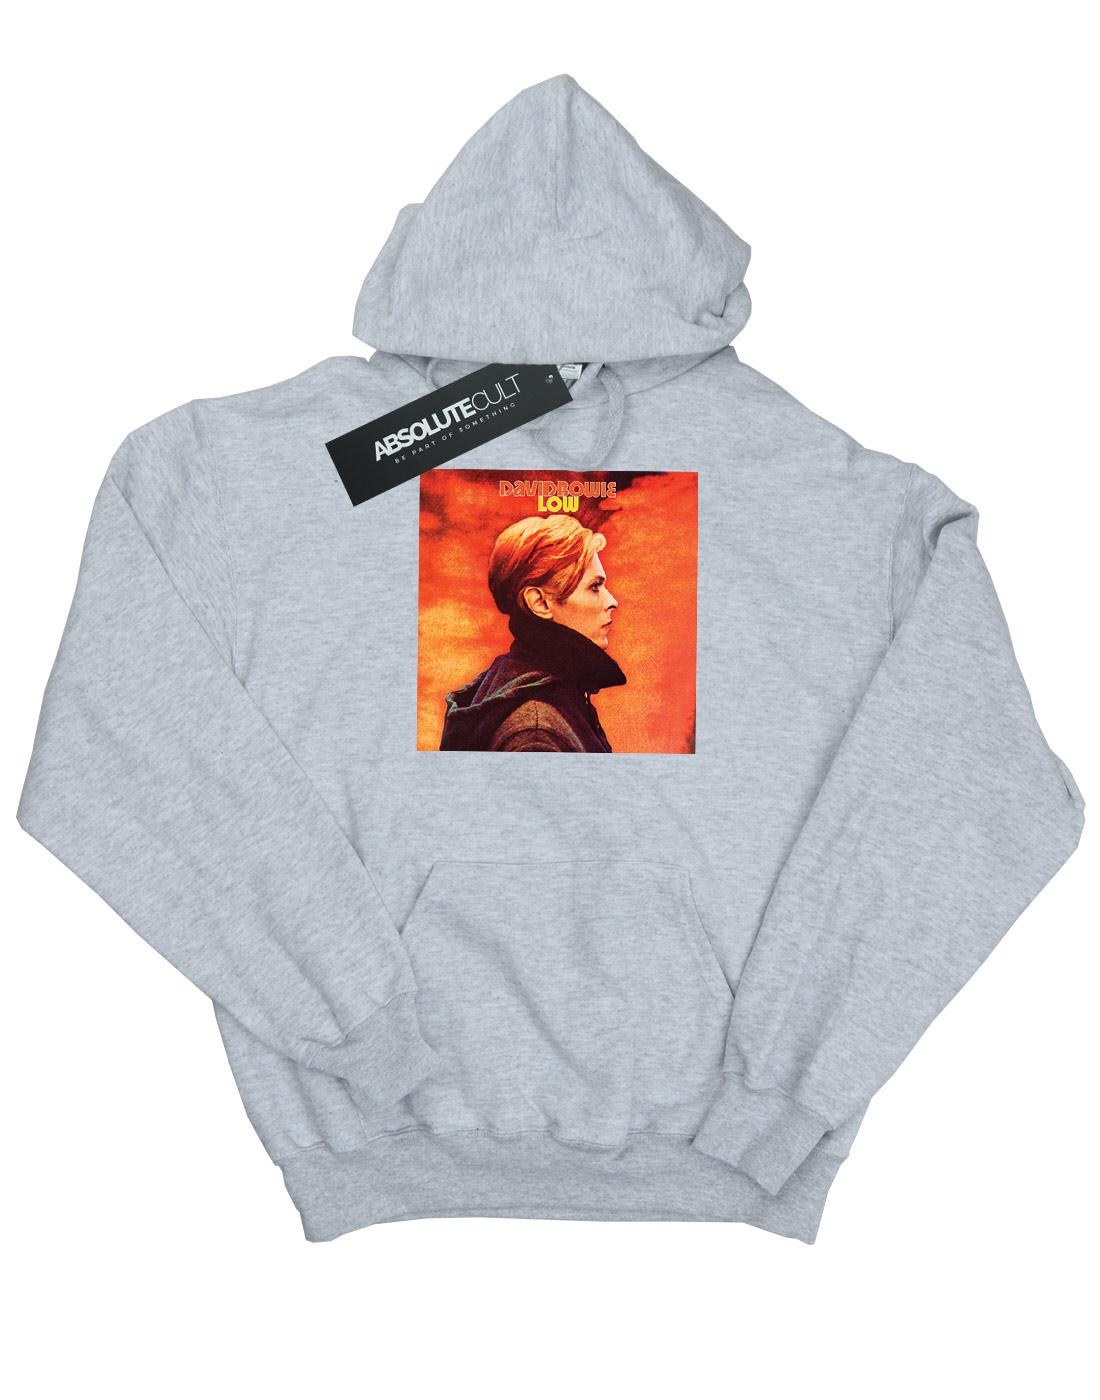 David David David Bowie Women's Low Album Cover Hoodie c11fa6